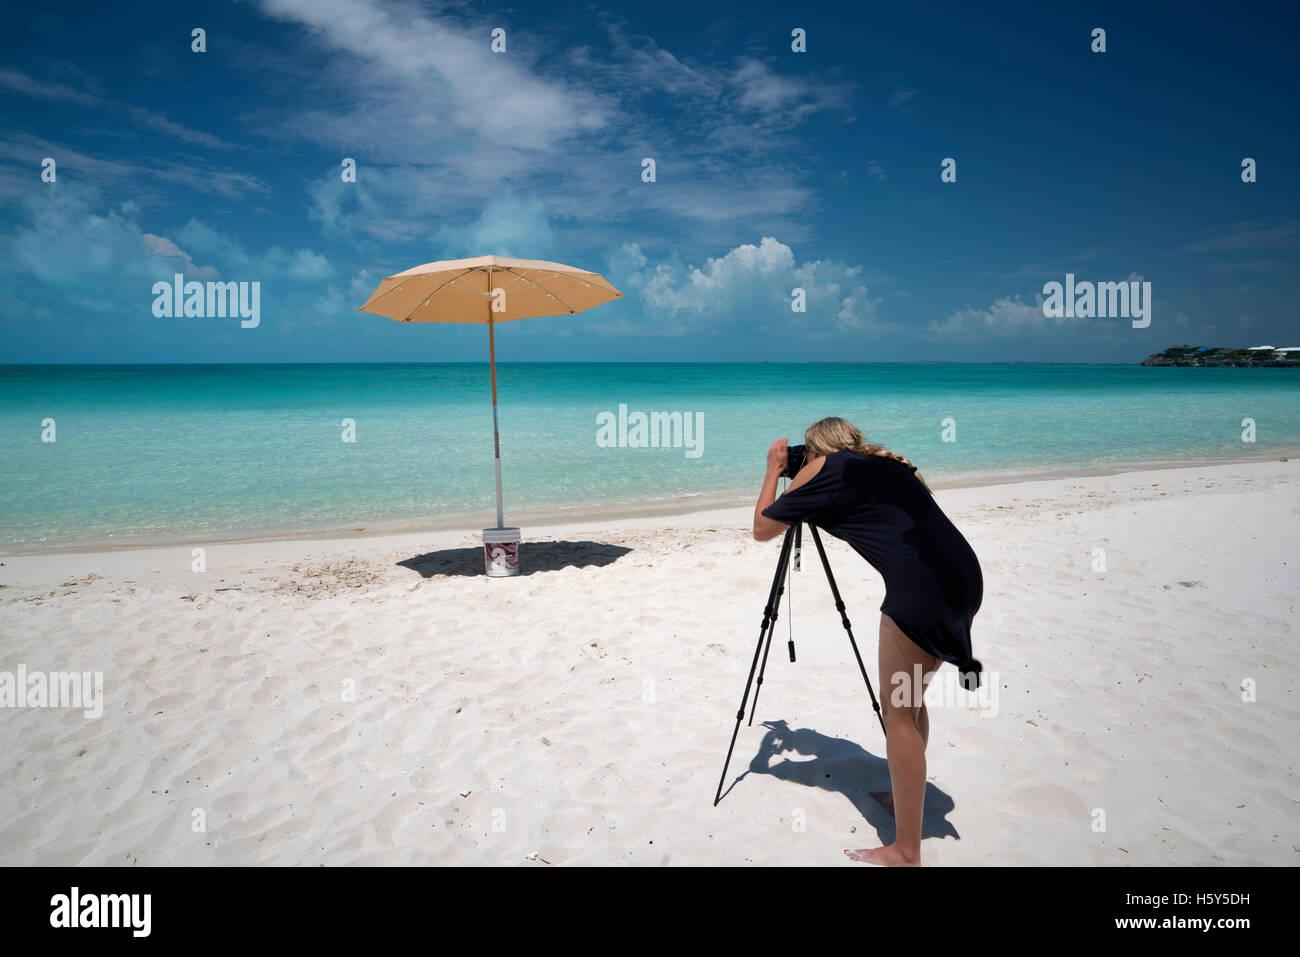 Fotograf fotografiere Regenschirm Sappodilla Bay. P {Rovidenciales, Turks- und Caicosinseln Stockbild